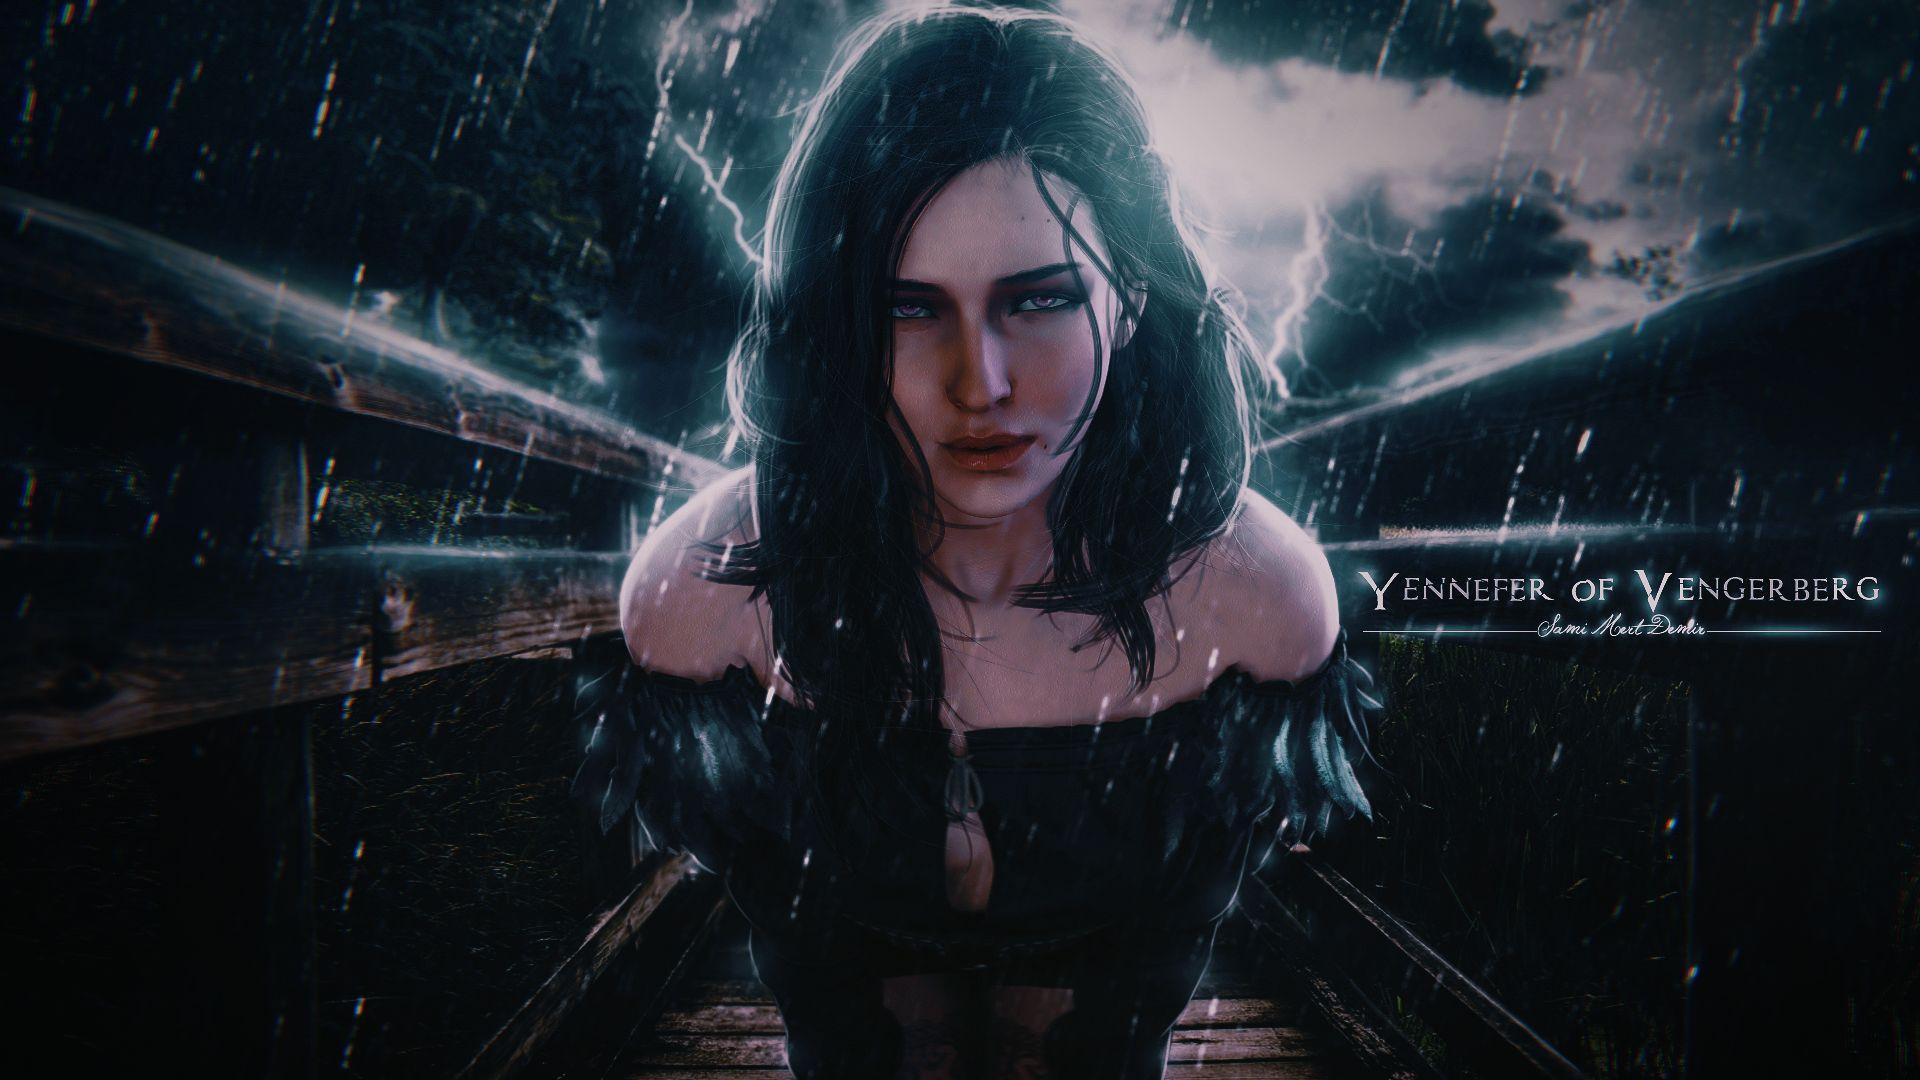 Witcher Yennefer, HD Wallpaper